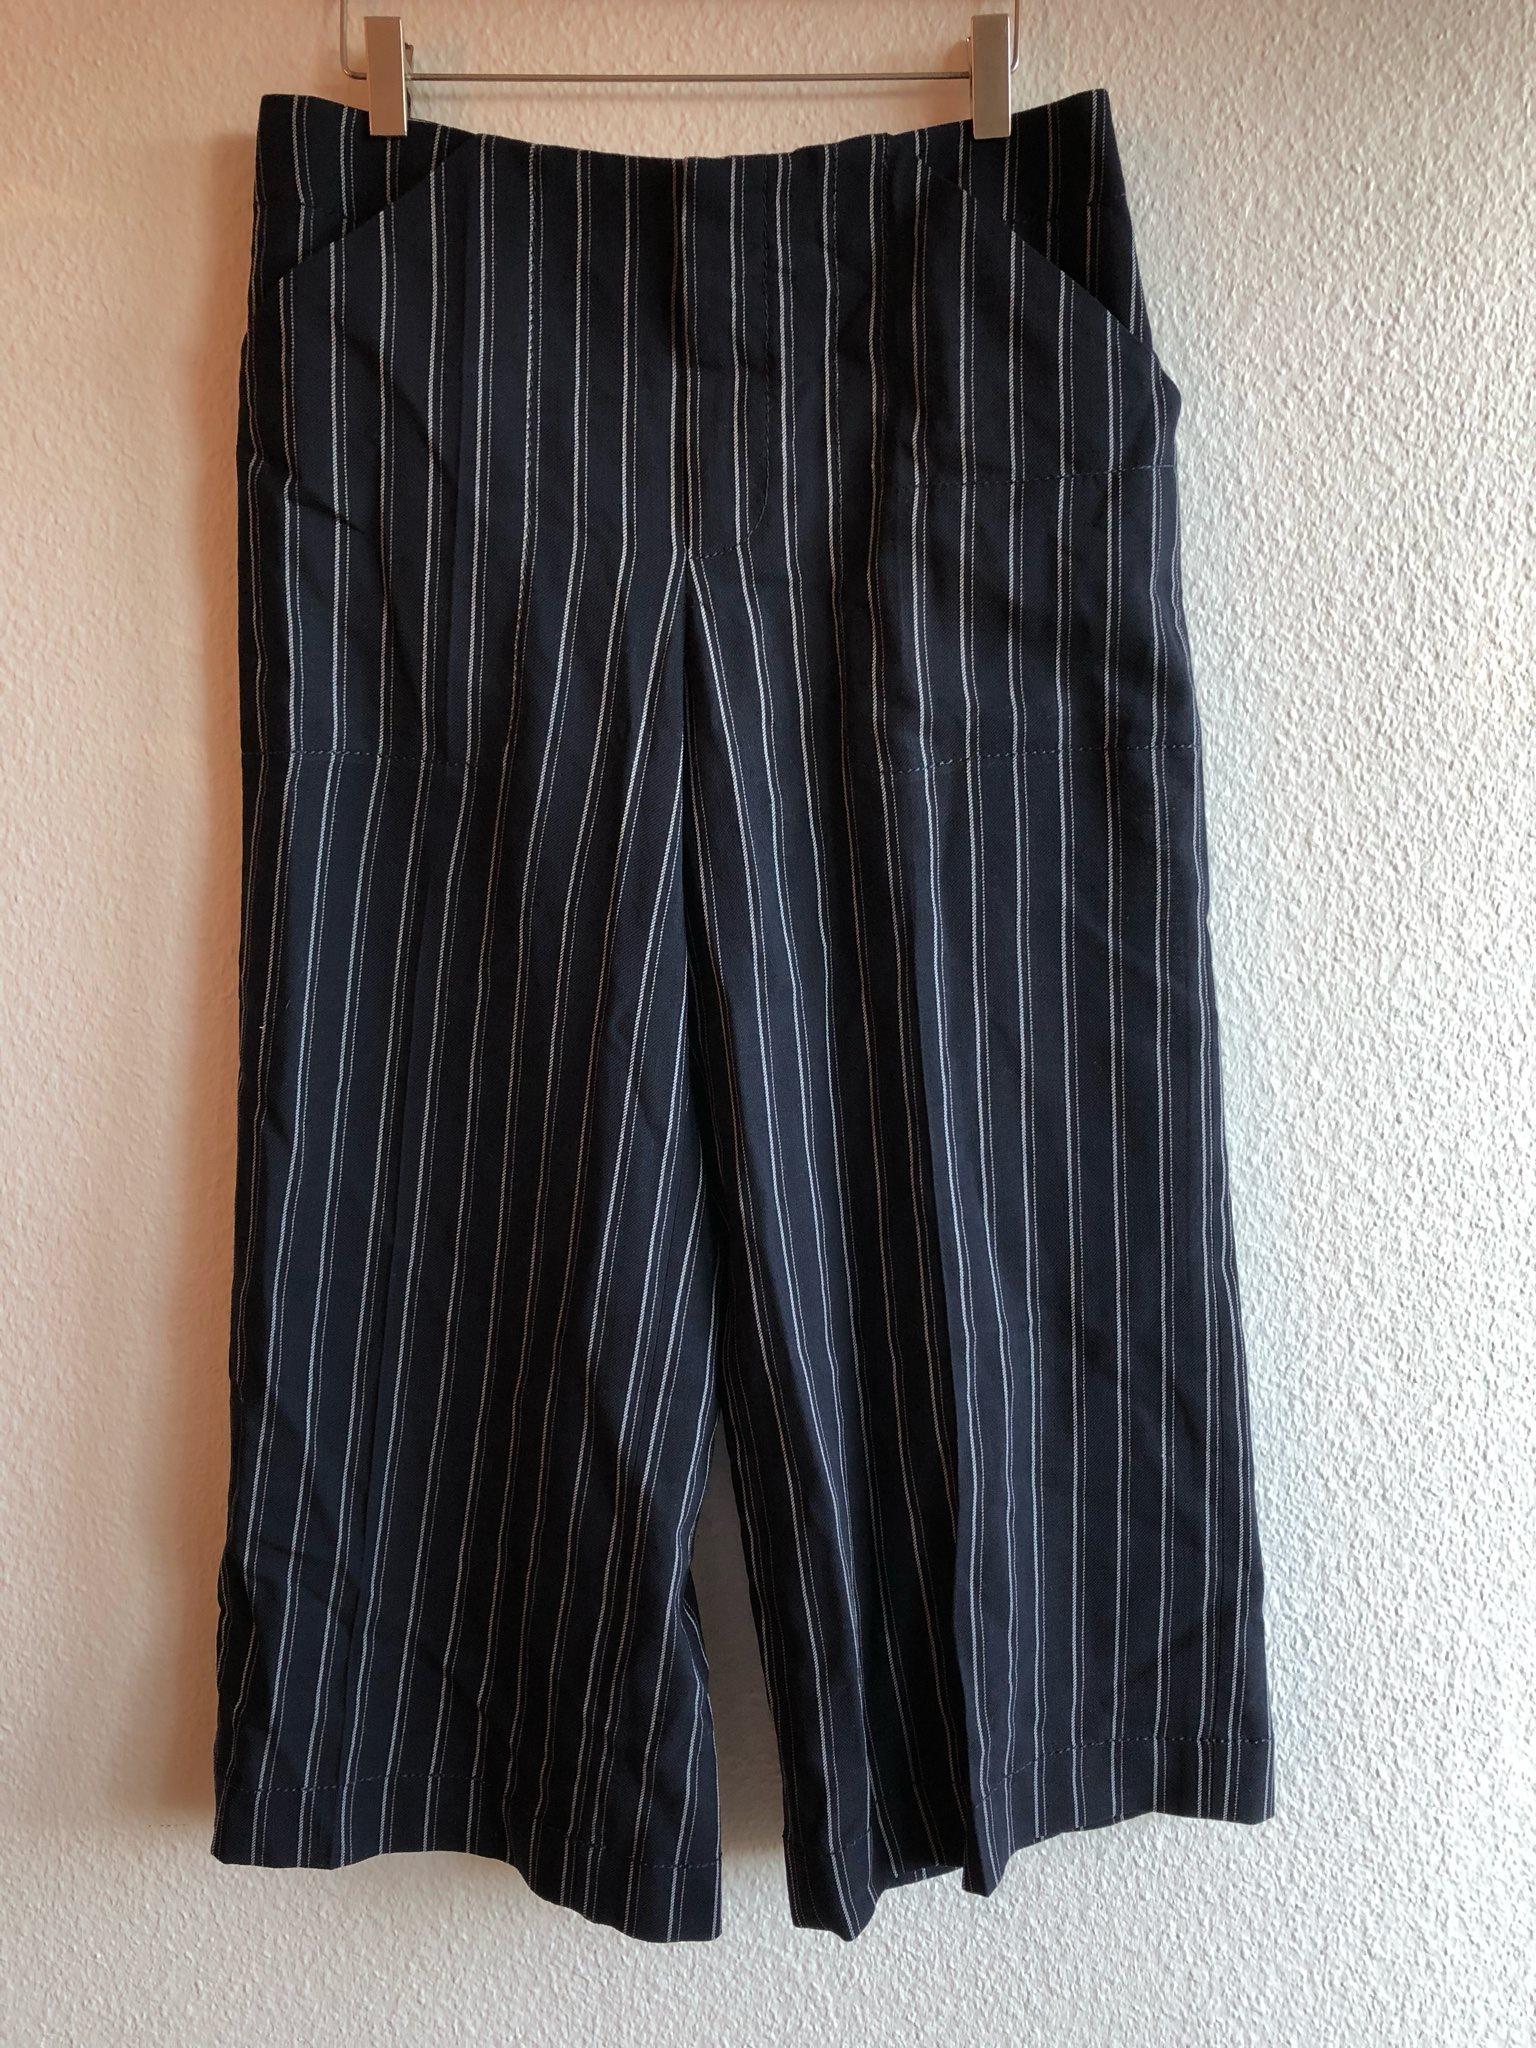 ACNE STUDIOS - Cropped mjuka byxor vit/blå randiga strl 36